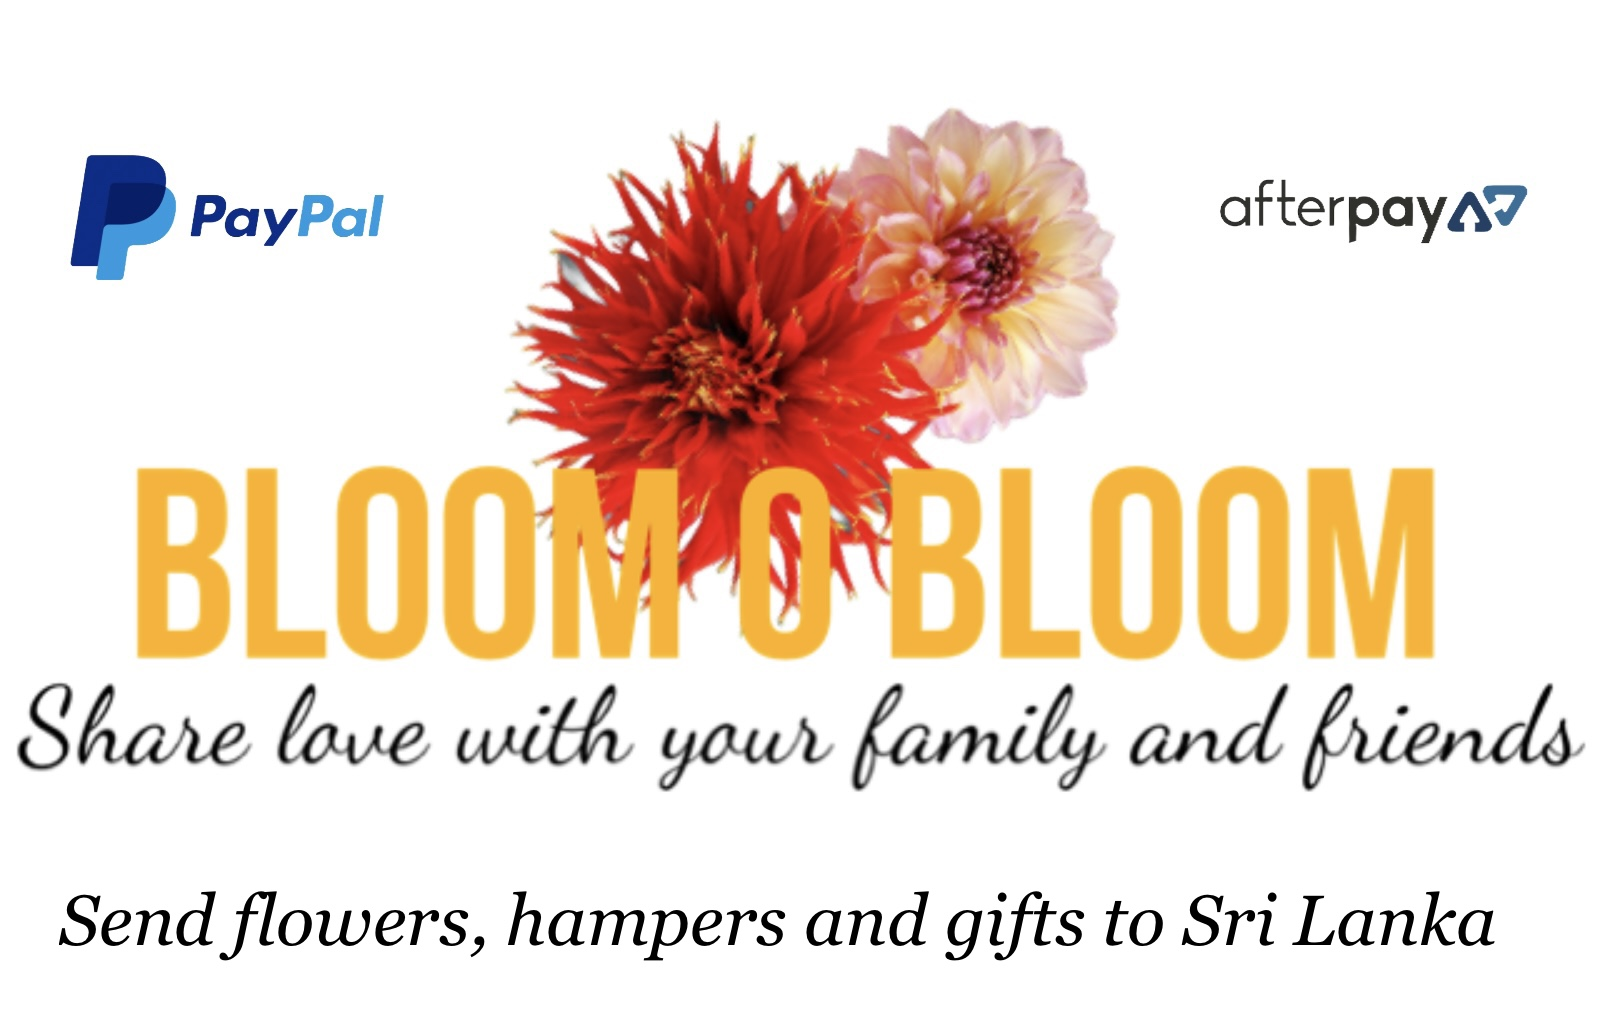 Send gifts to Sri Lanka